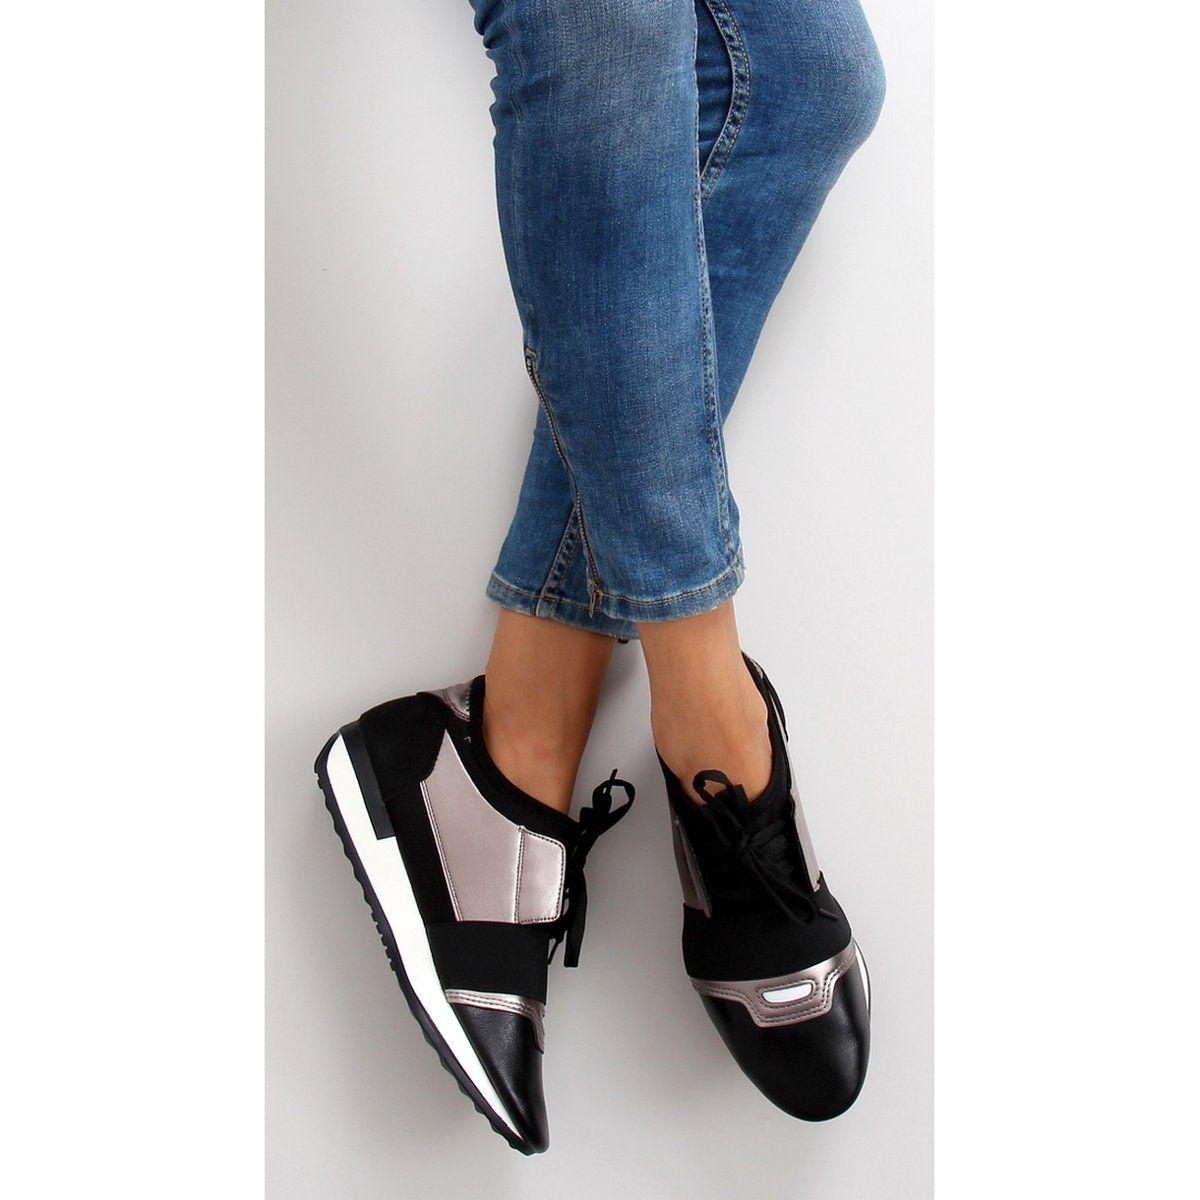 Buty Sportowe Dla Kobiet 86 173 Black Guncolor Czarne Szare New Balance Sneaker Sneakers Fashion